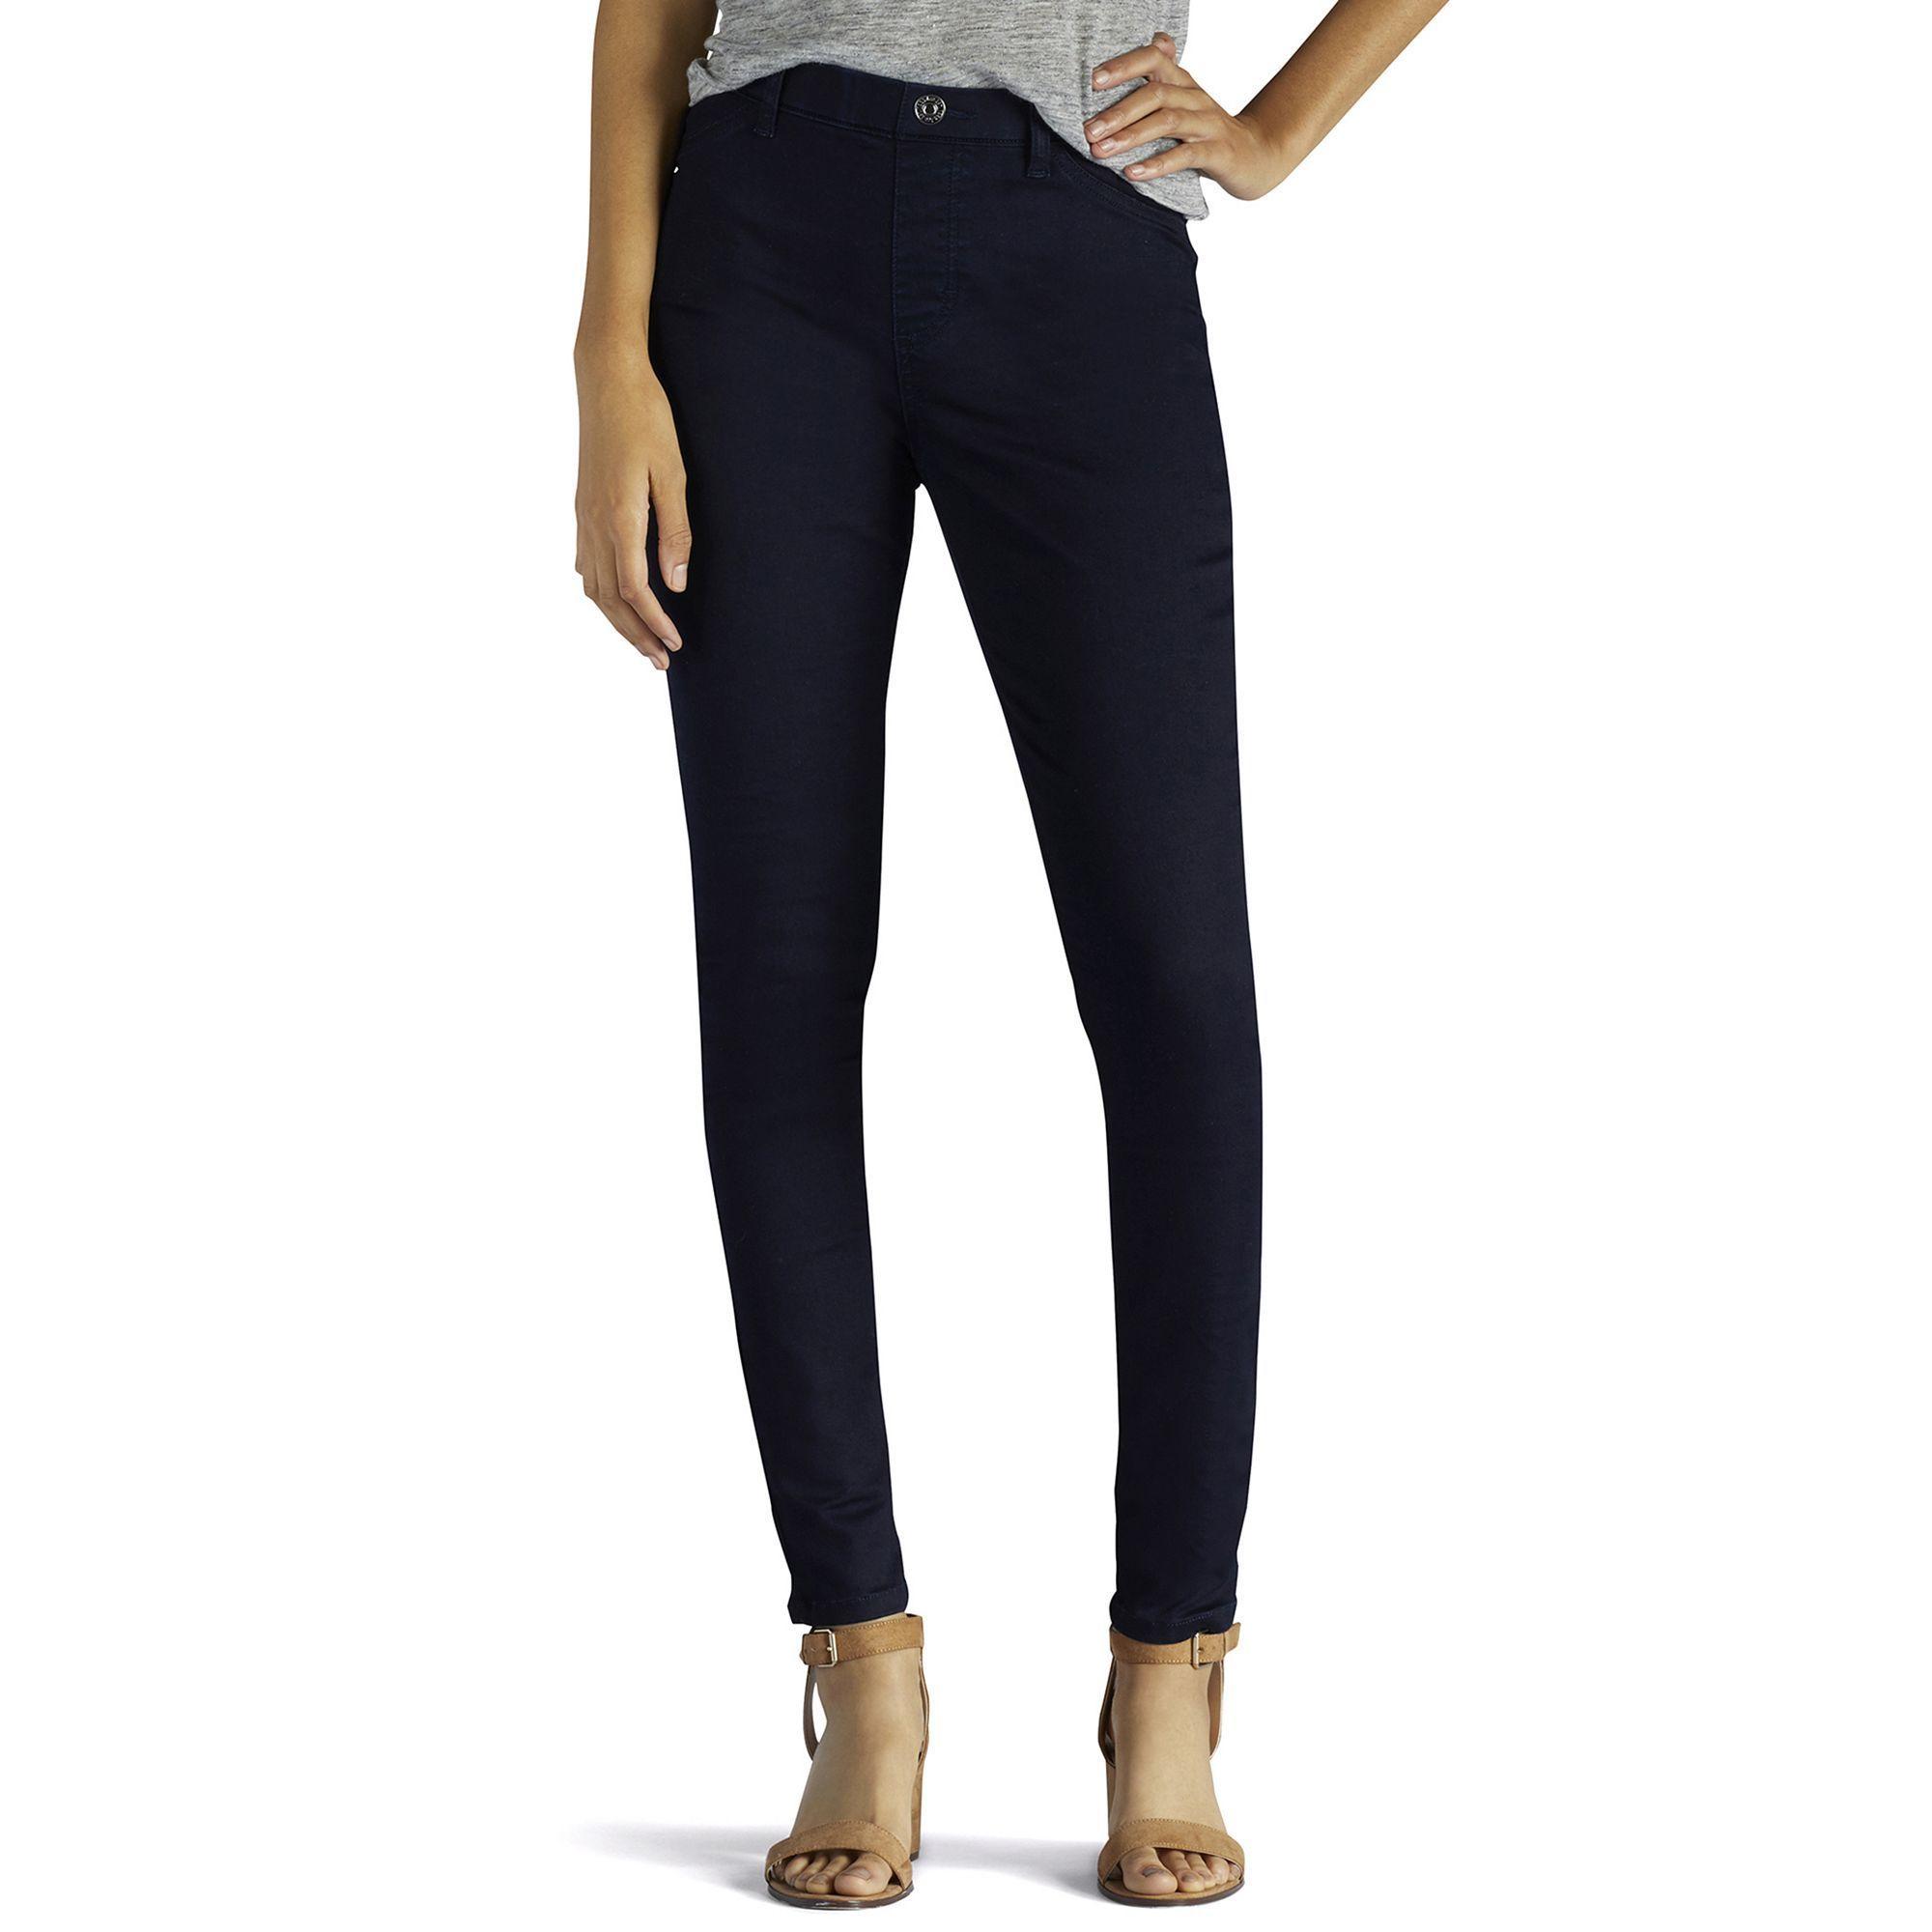 KSEERBABALL Womens High Waist Yoga Pants Workout Running Pants Legging Full-Length Pants